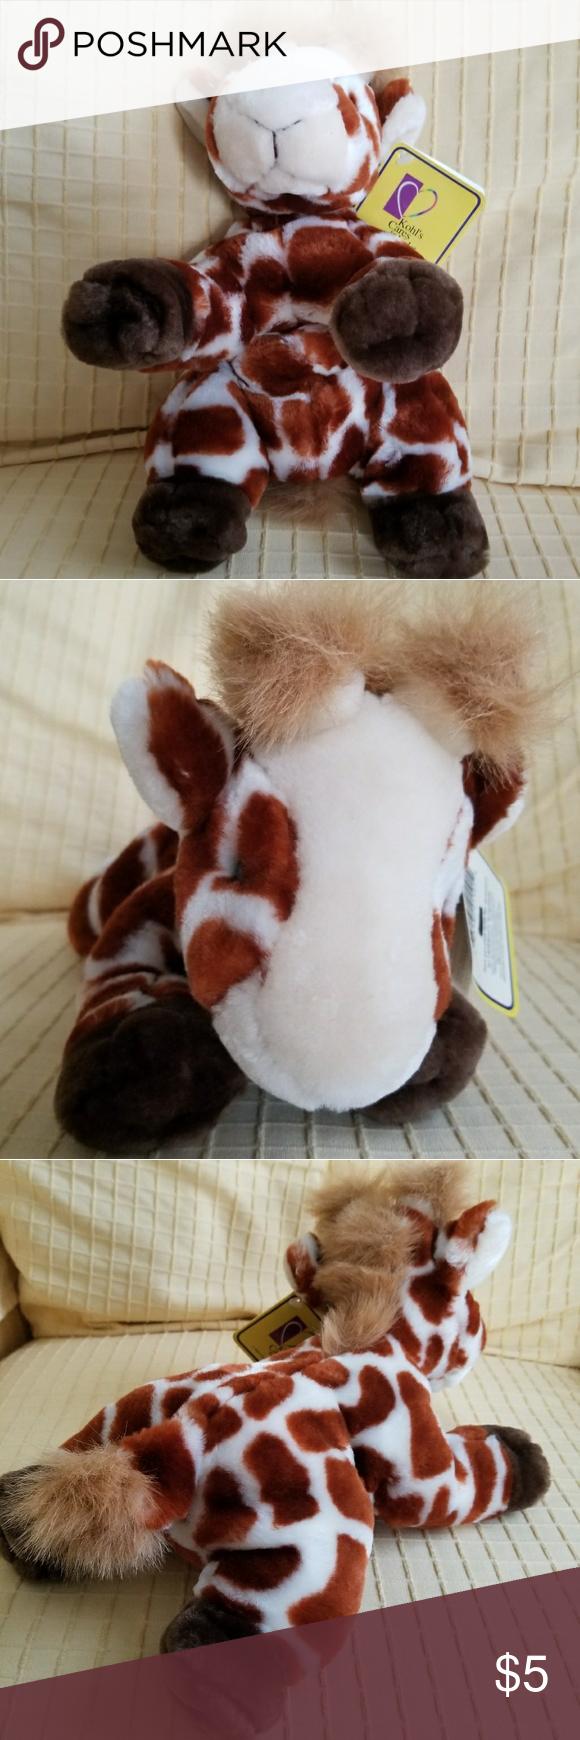 Adopt Me Giraffe Stuffed Animal Plush Toy Very Cute Giraffe